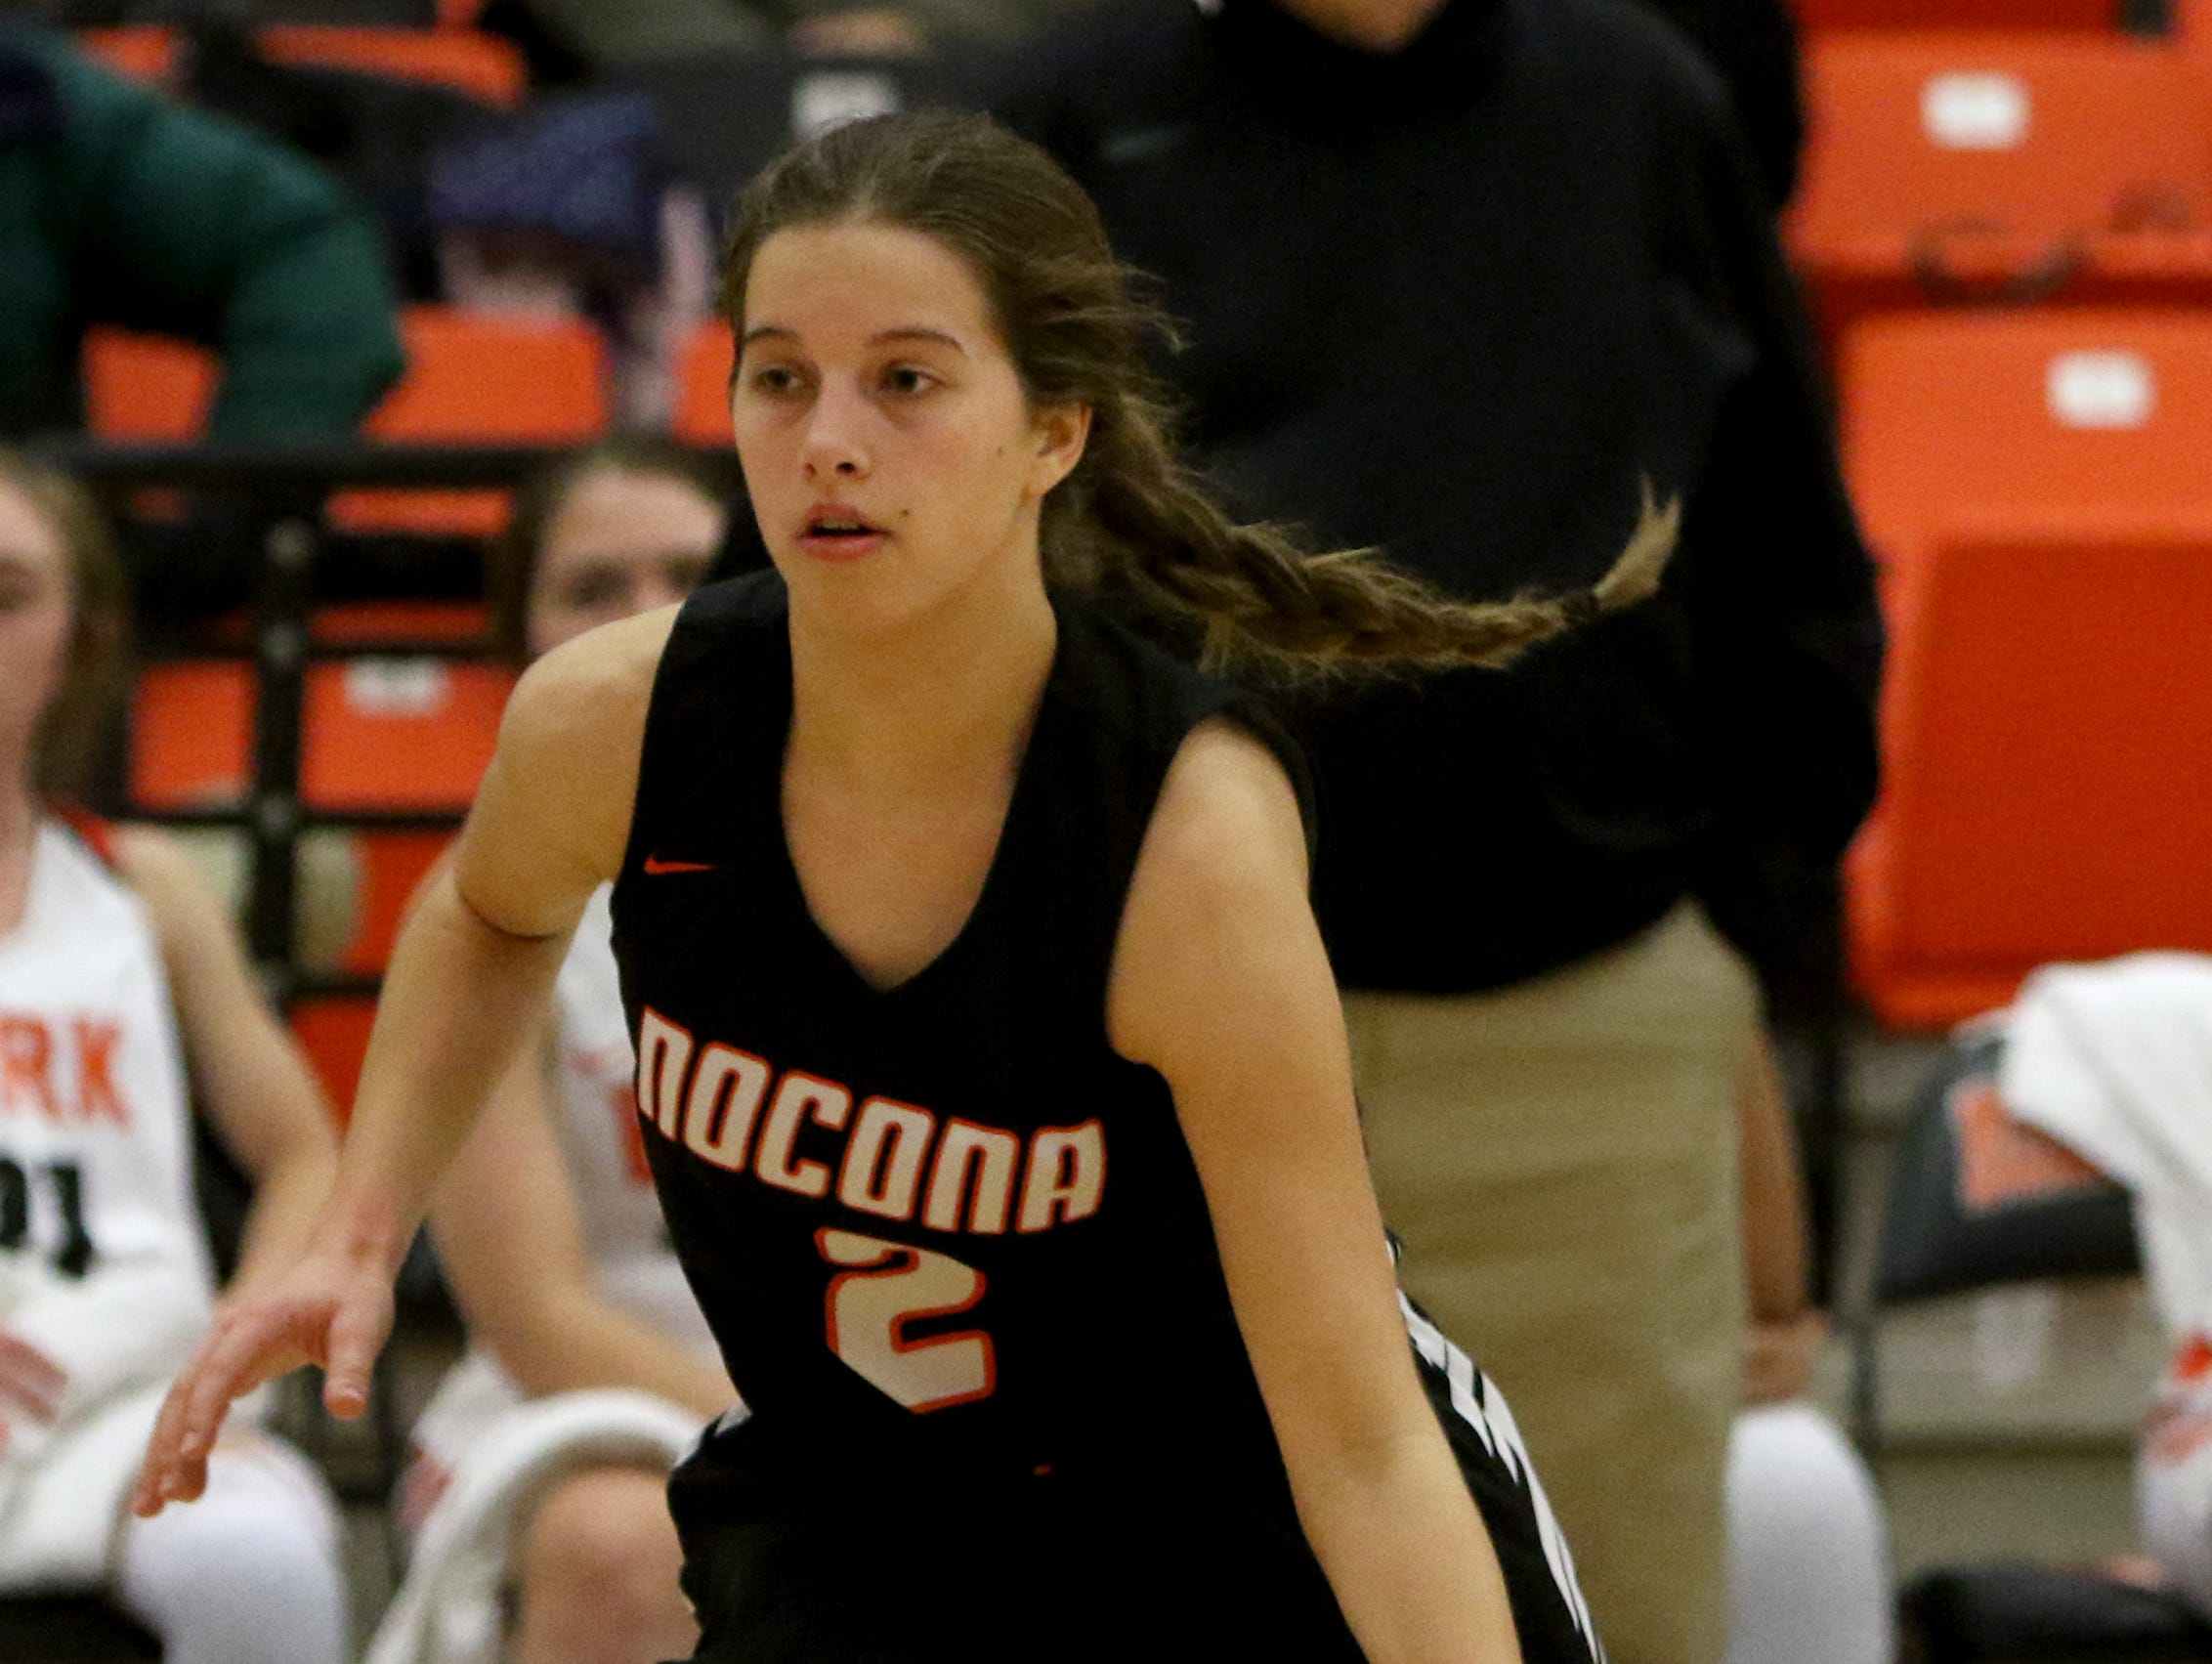 Nocona's Trystin Fenoglio drives to the basket in the game against Burkburnett Tuesday, Dec. 4, 2018, in Burkburnett.